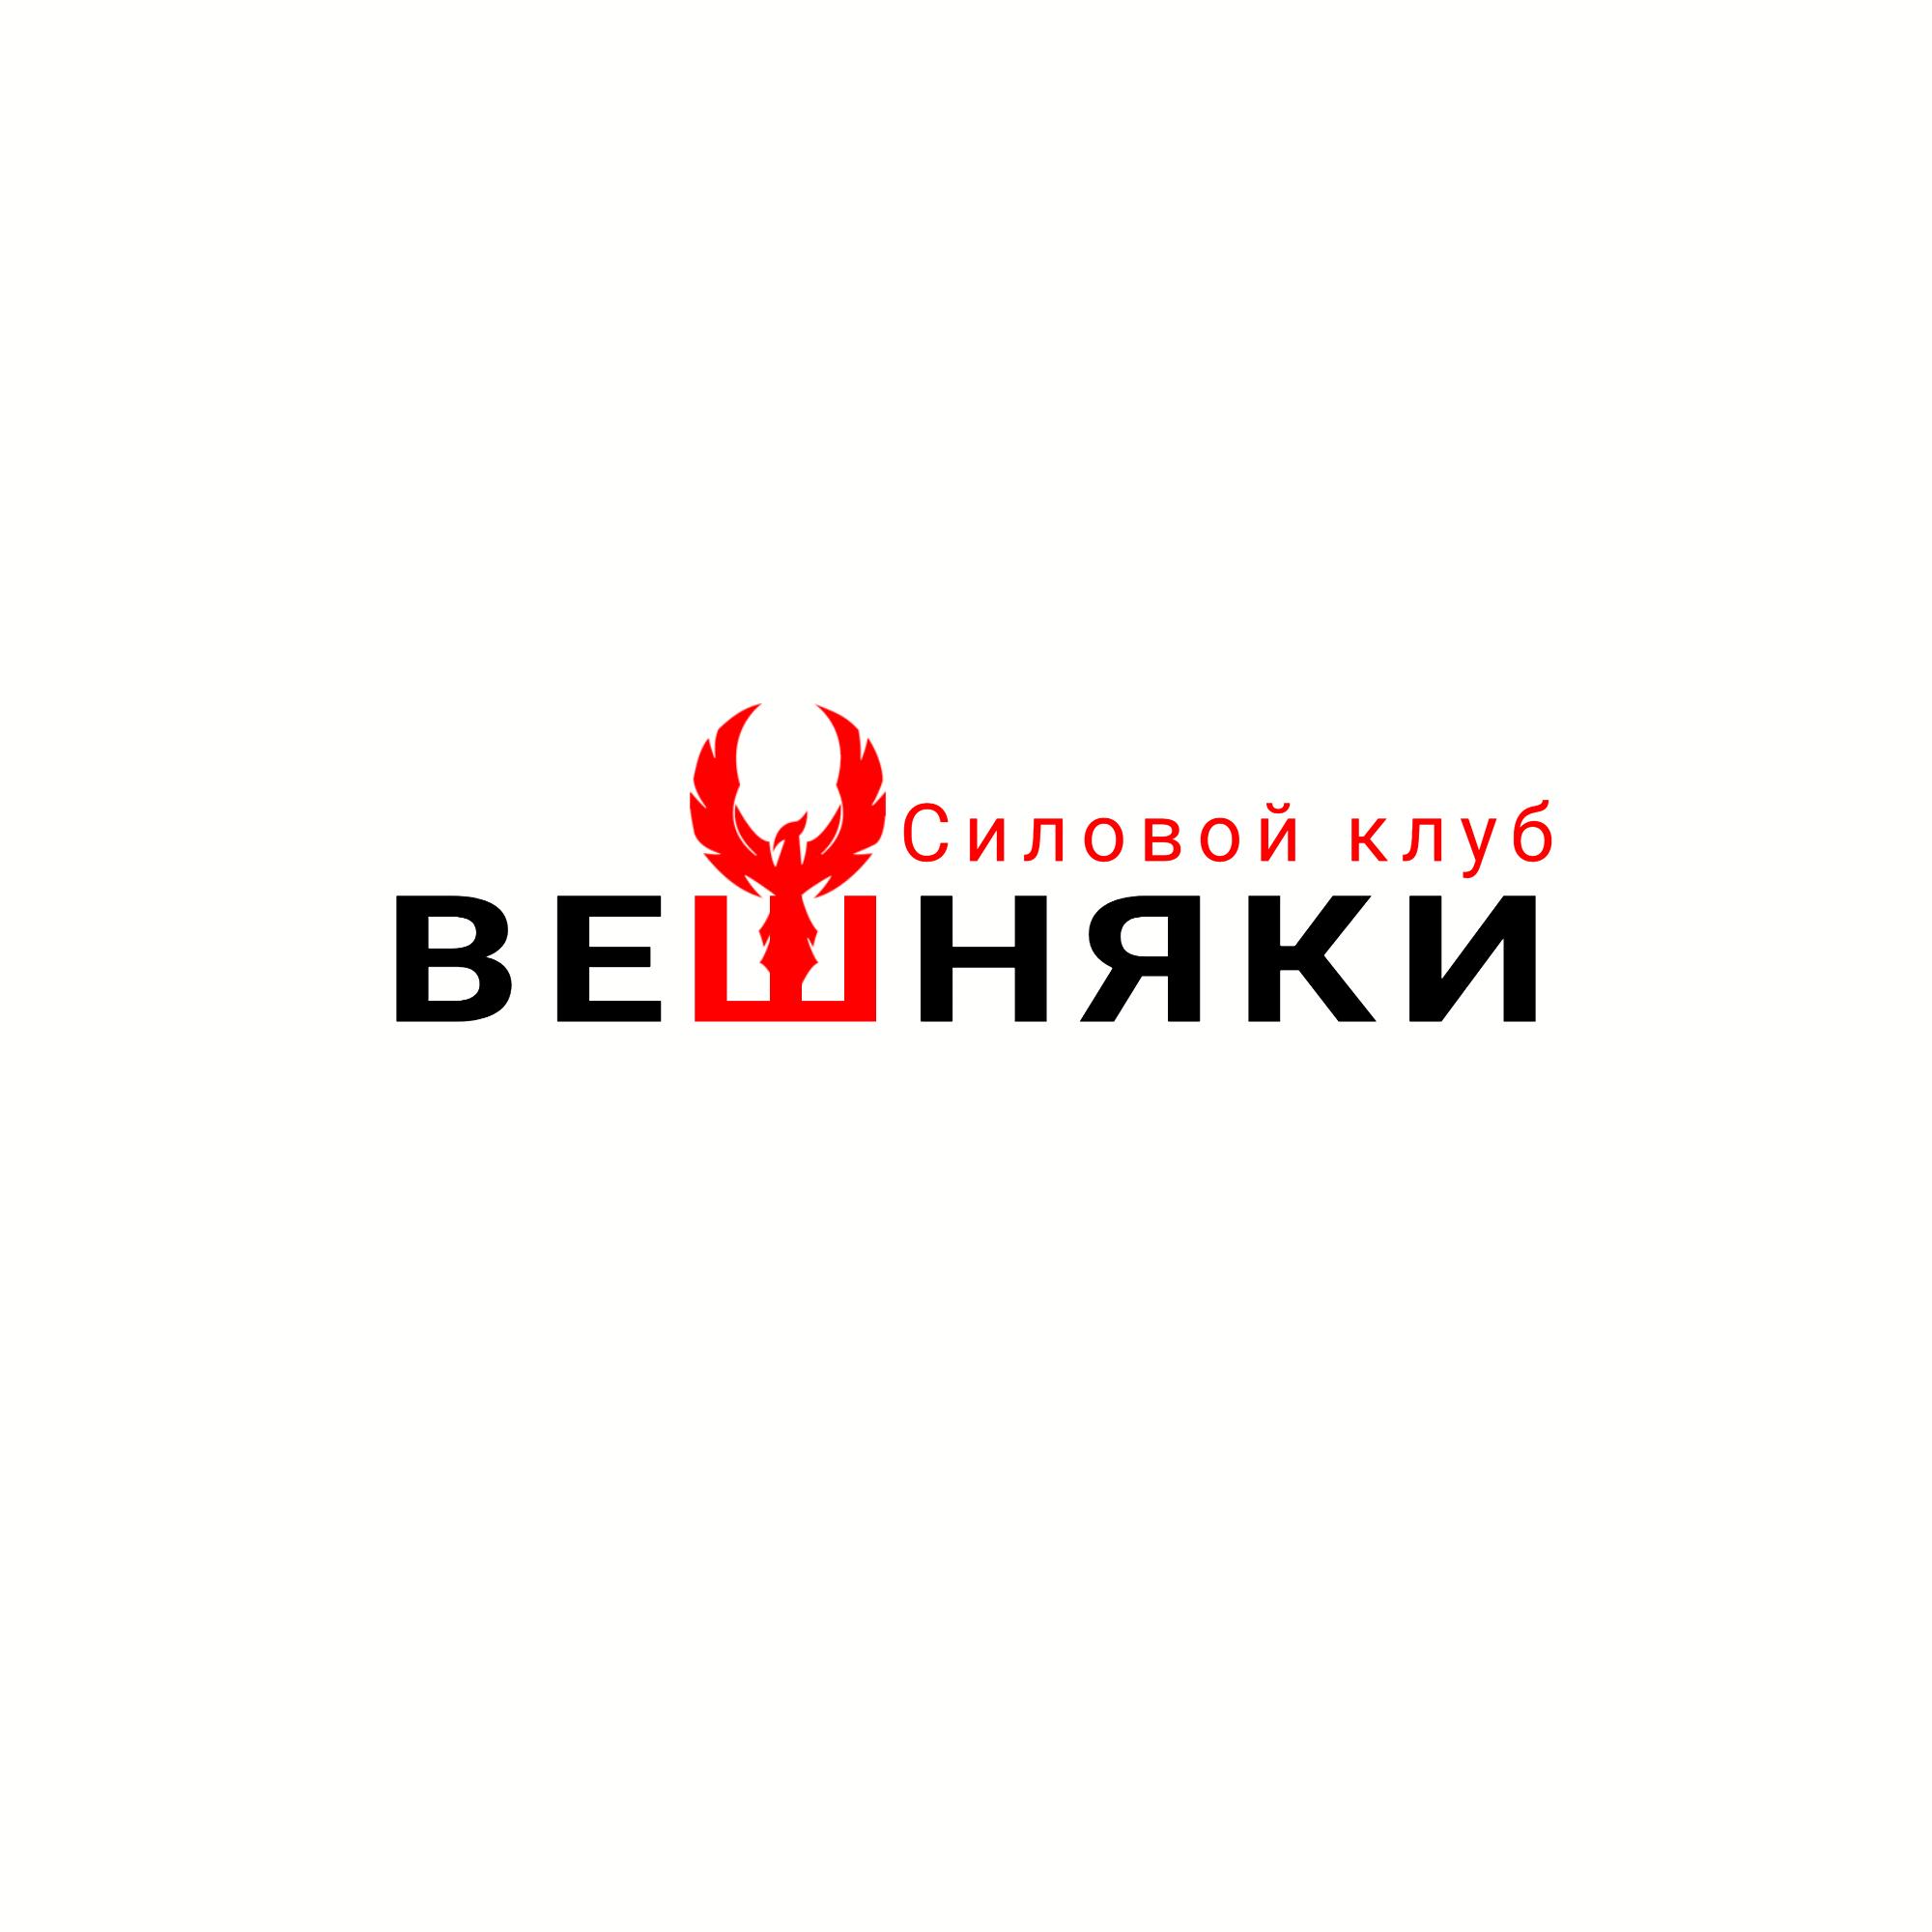 Адаптация (разработка) логотипа Силового клуба ВЕШНЯКИ в инт фото f_4875fbcfd7004602.jpg